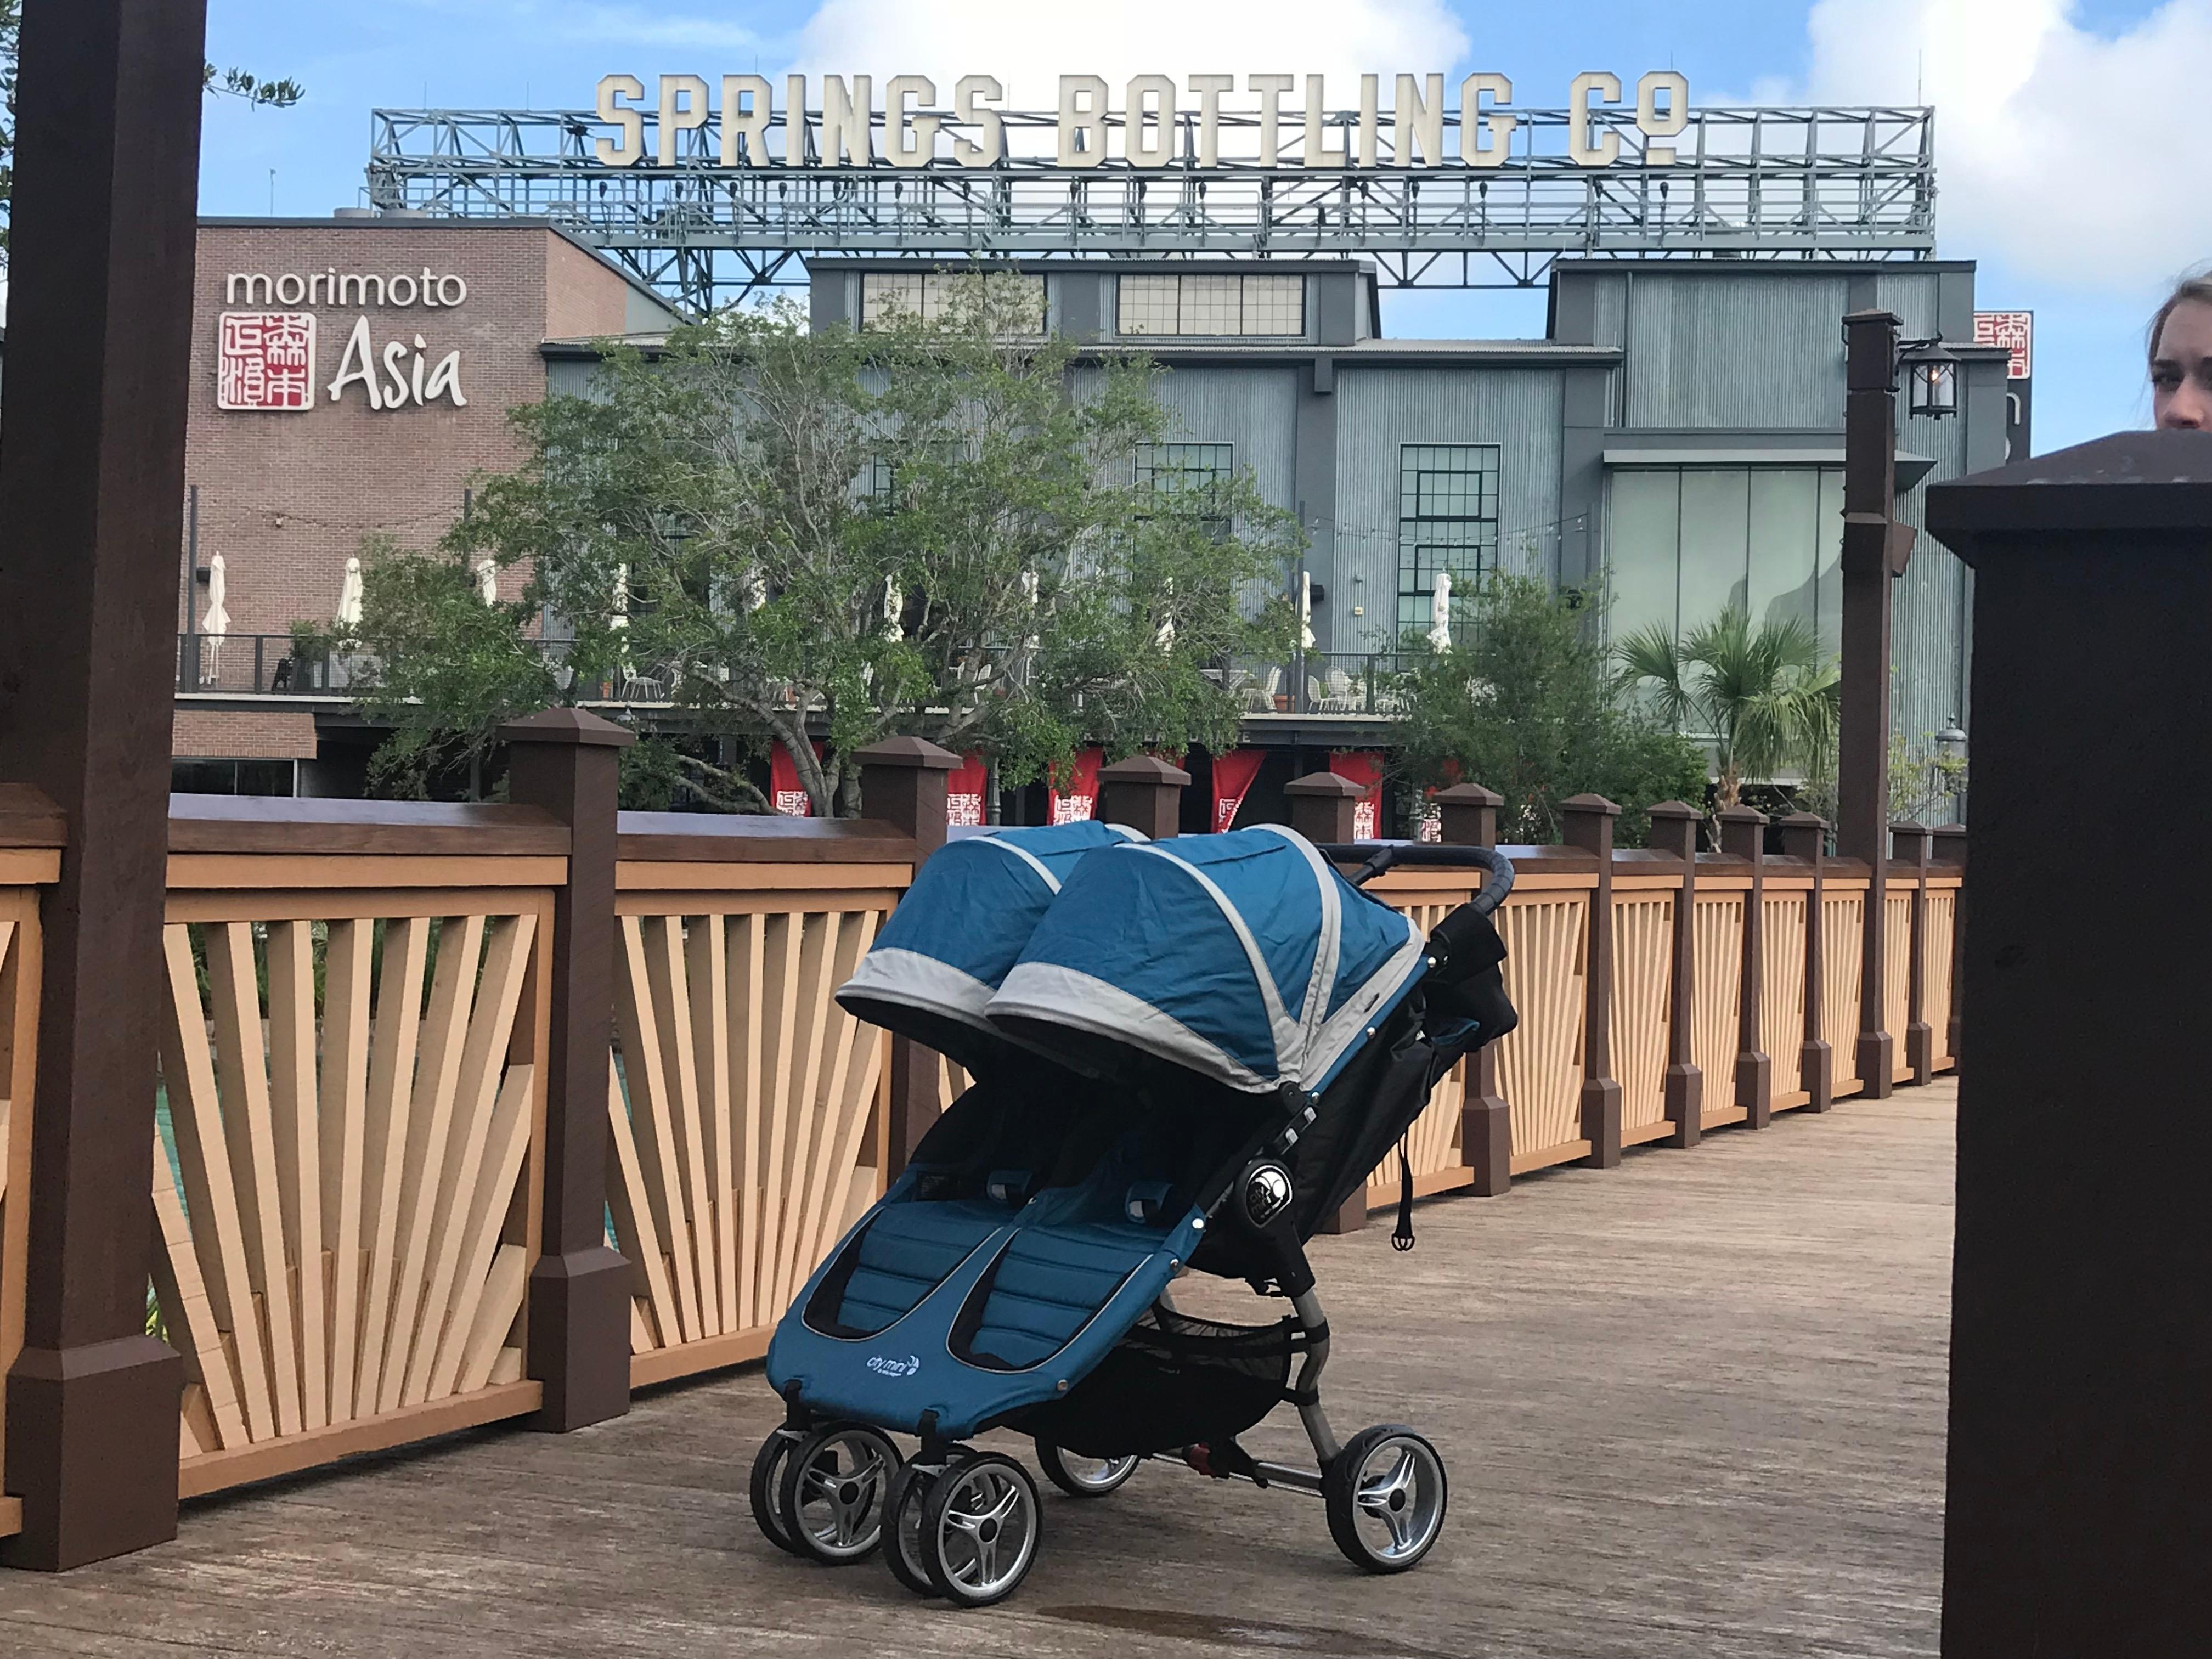 Stroller Rentals Disney image 61